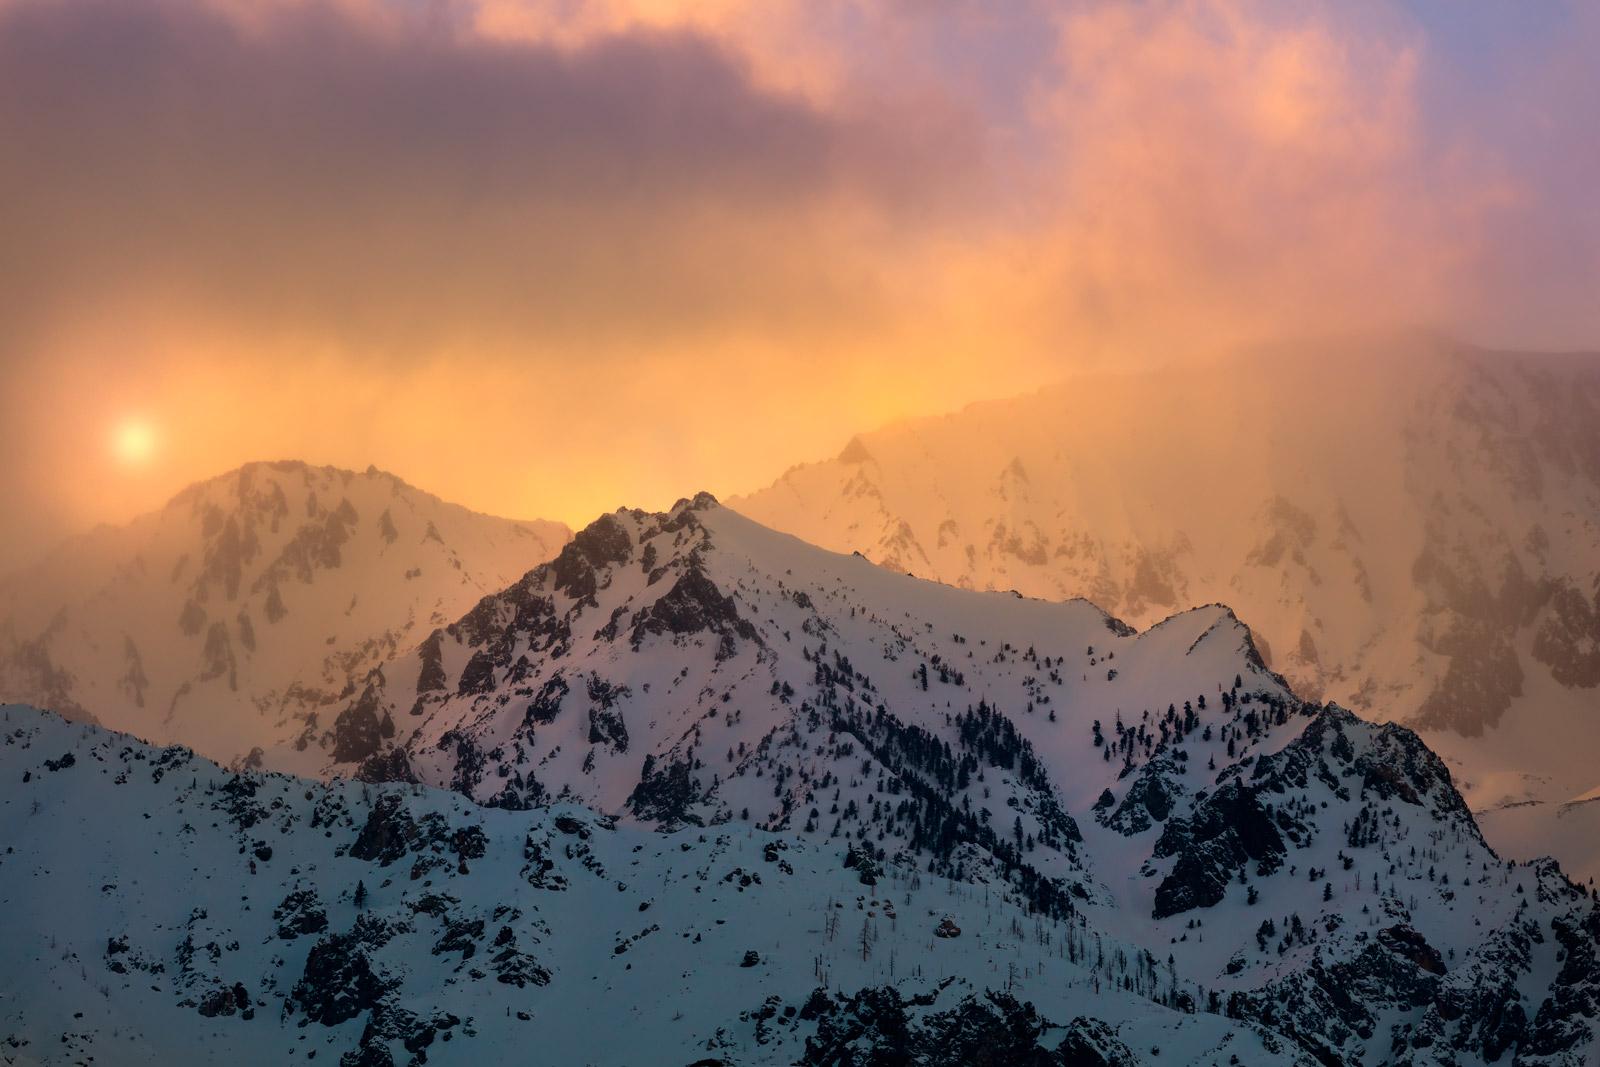 California, Eastern Sierra, Winter, Sunset, Mountain, limited edition, photograph, fine art, landscape, photo